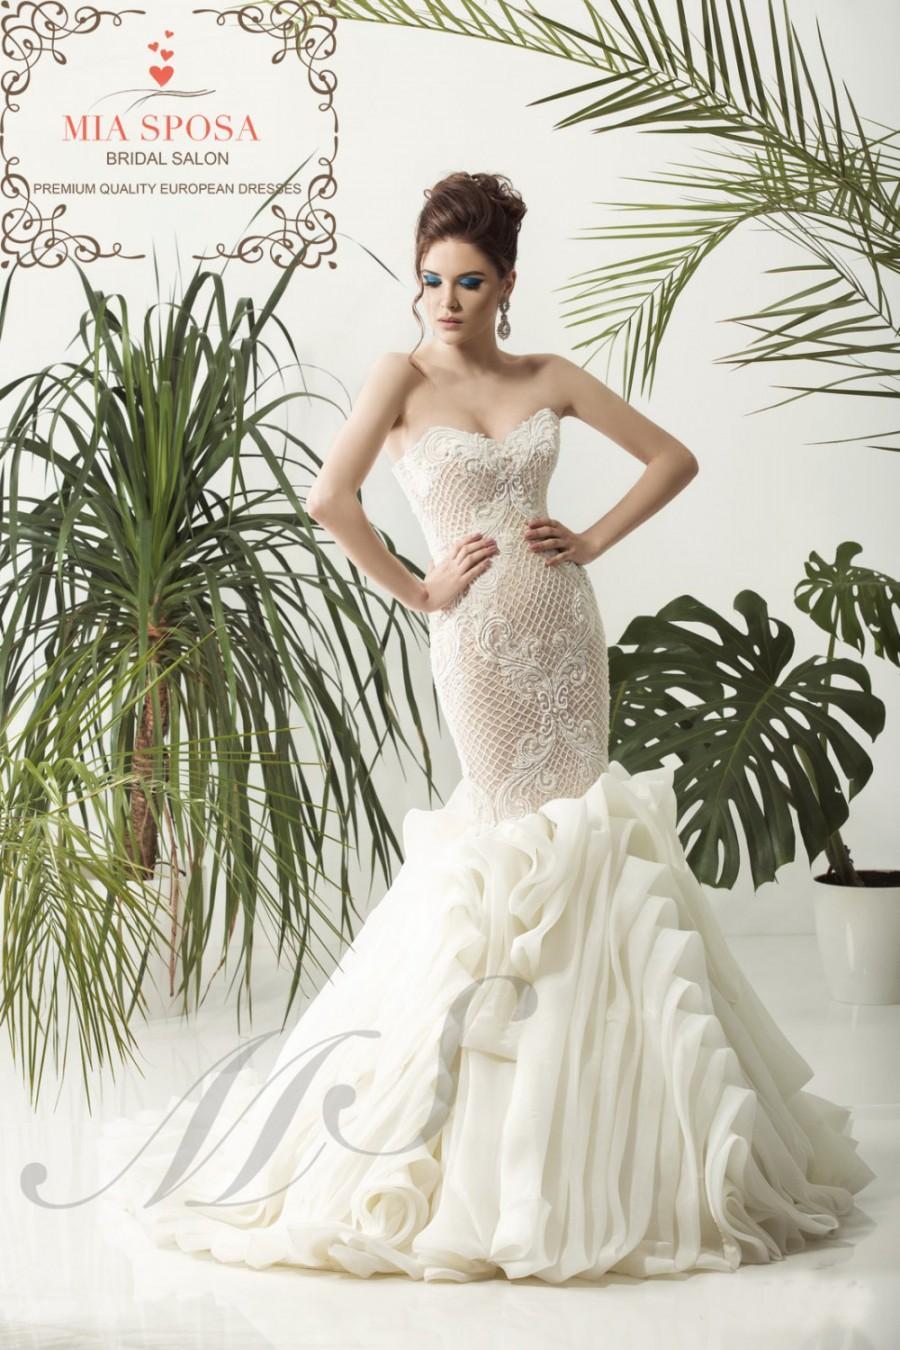 destination wedding dresses destination wedding dresses Sleeveless Filigree Beaded Chiffon Dress